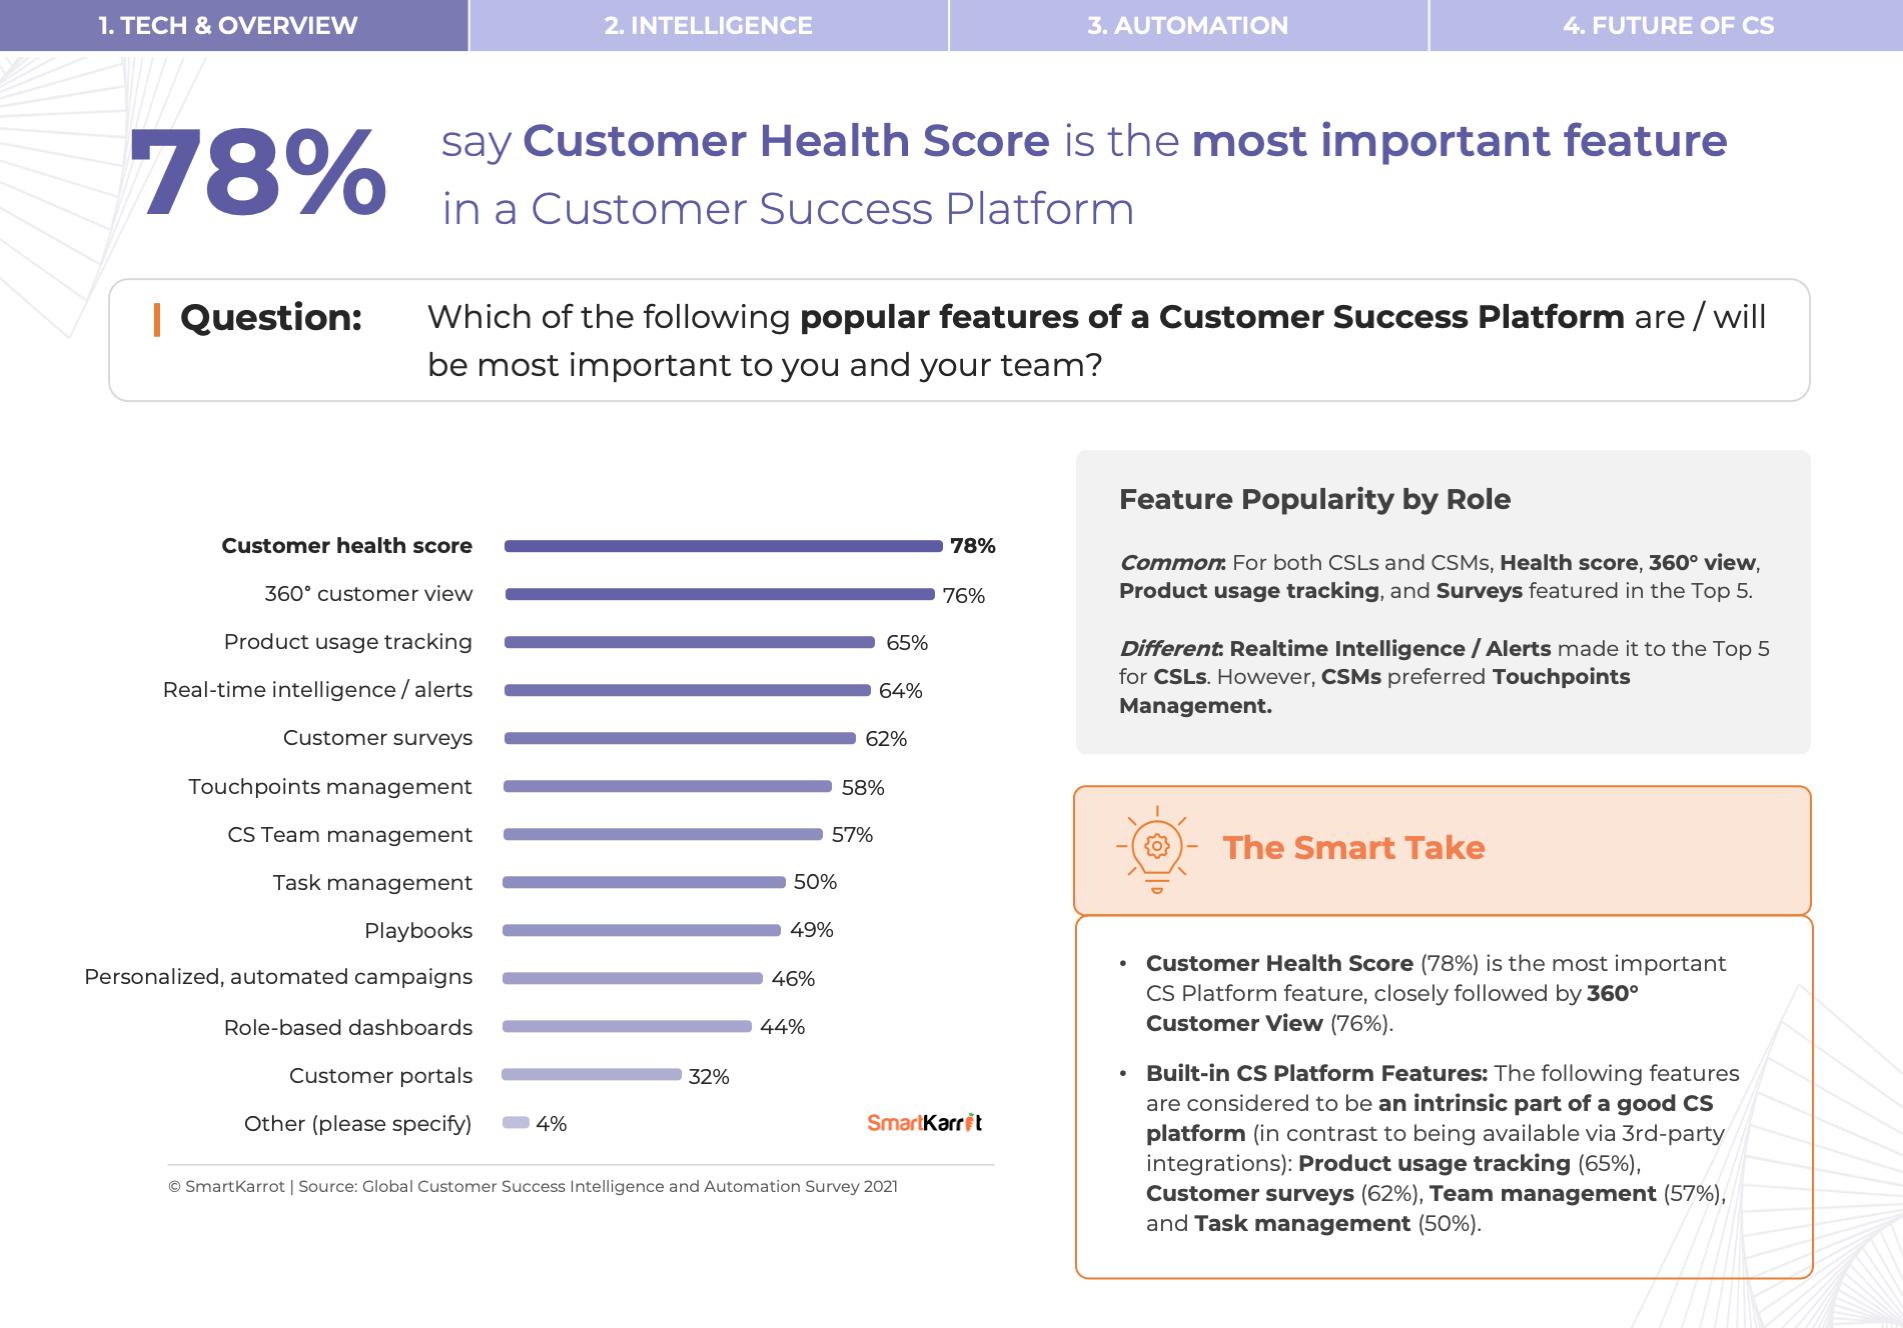 Customer Success Platform Features